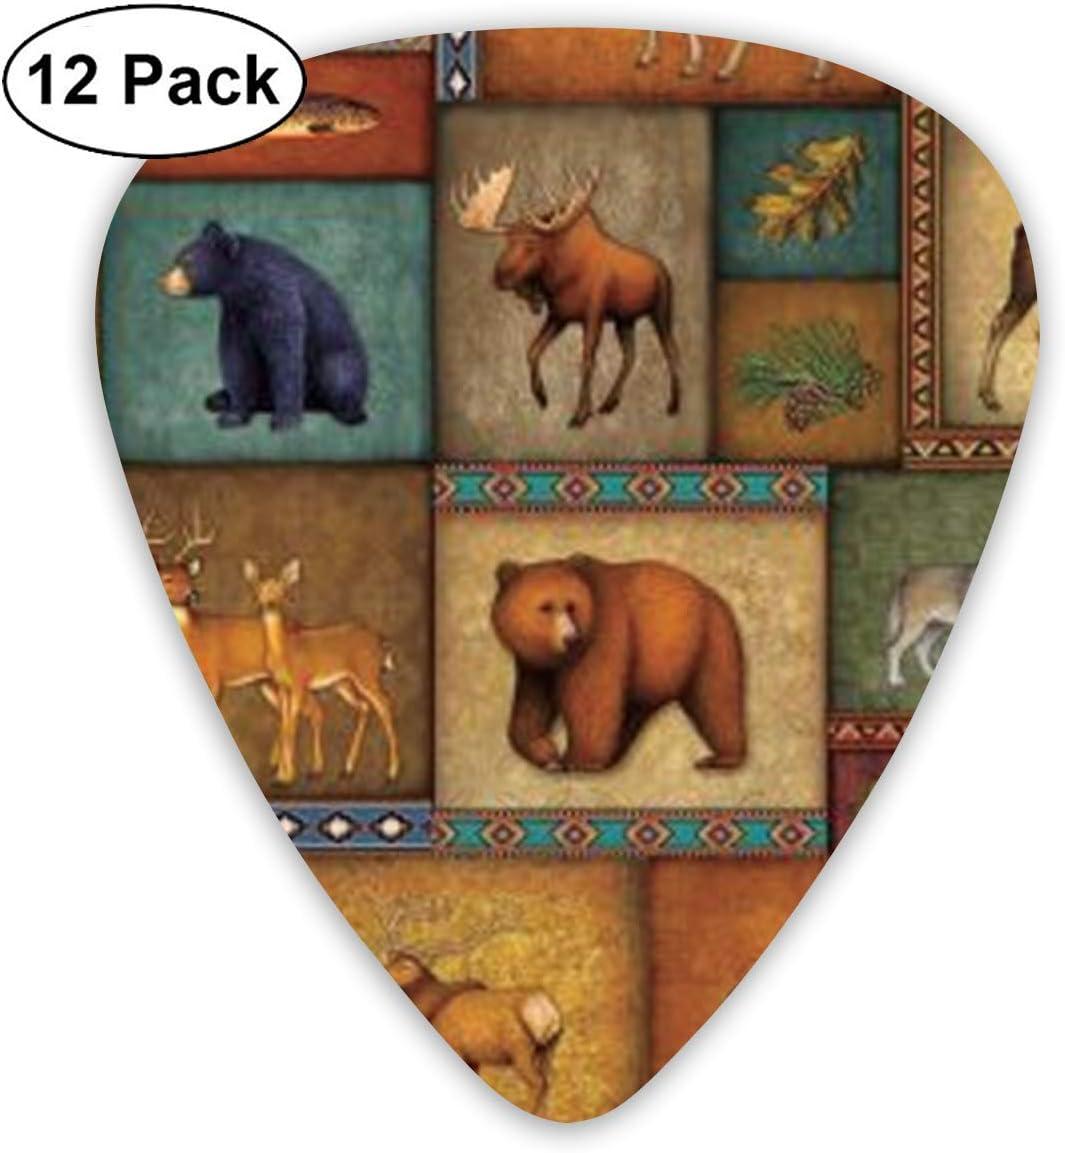 guitare vocale originale Guitares /électriques mandoline et basse TUIU Rustic Wildlife Bear Deer Moose Wolf 12-Pack Guitare classique M/édiators